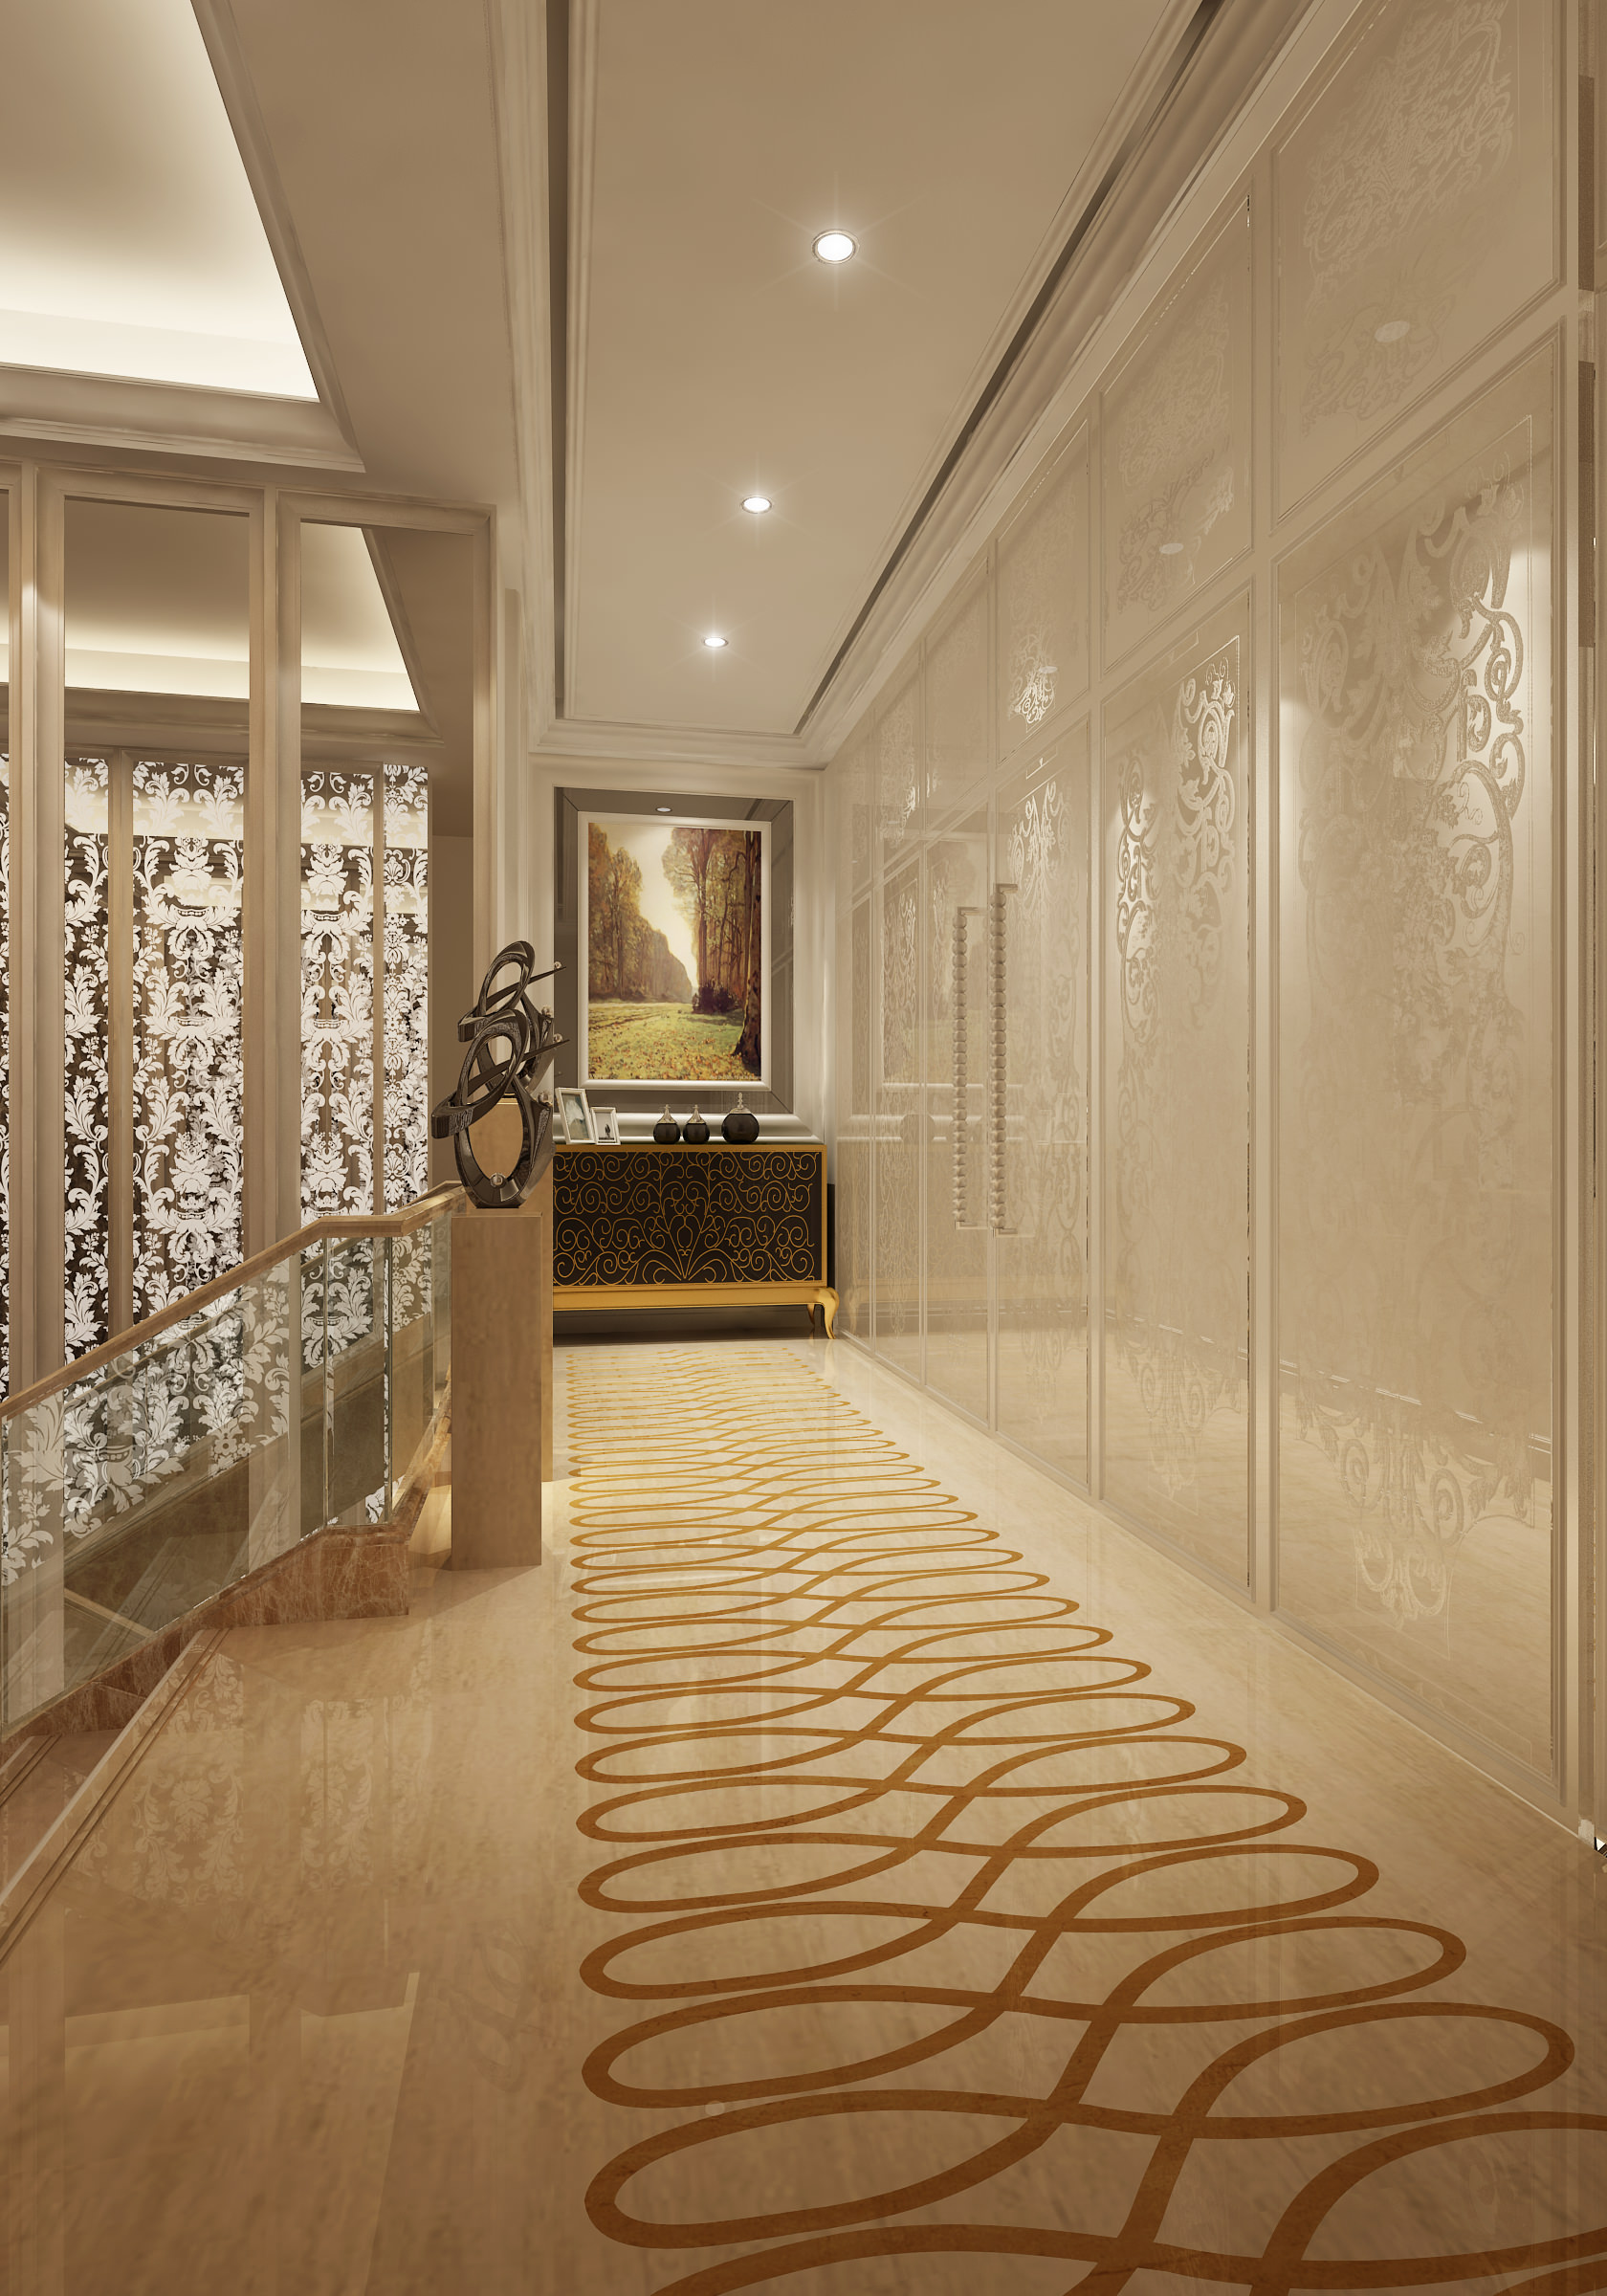 Corridor with partition decor and wall decor 3d model max - Corridor deco ...